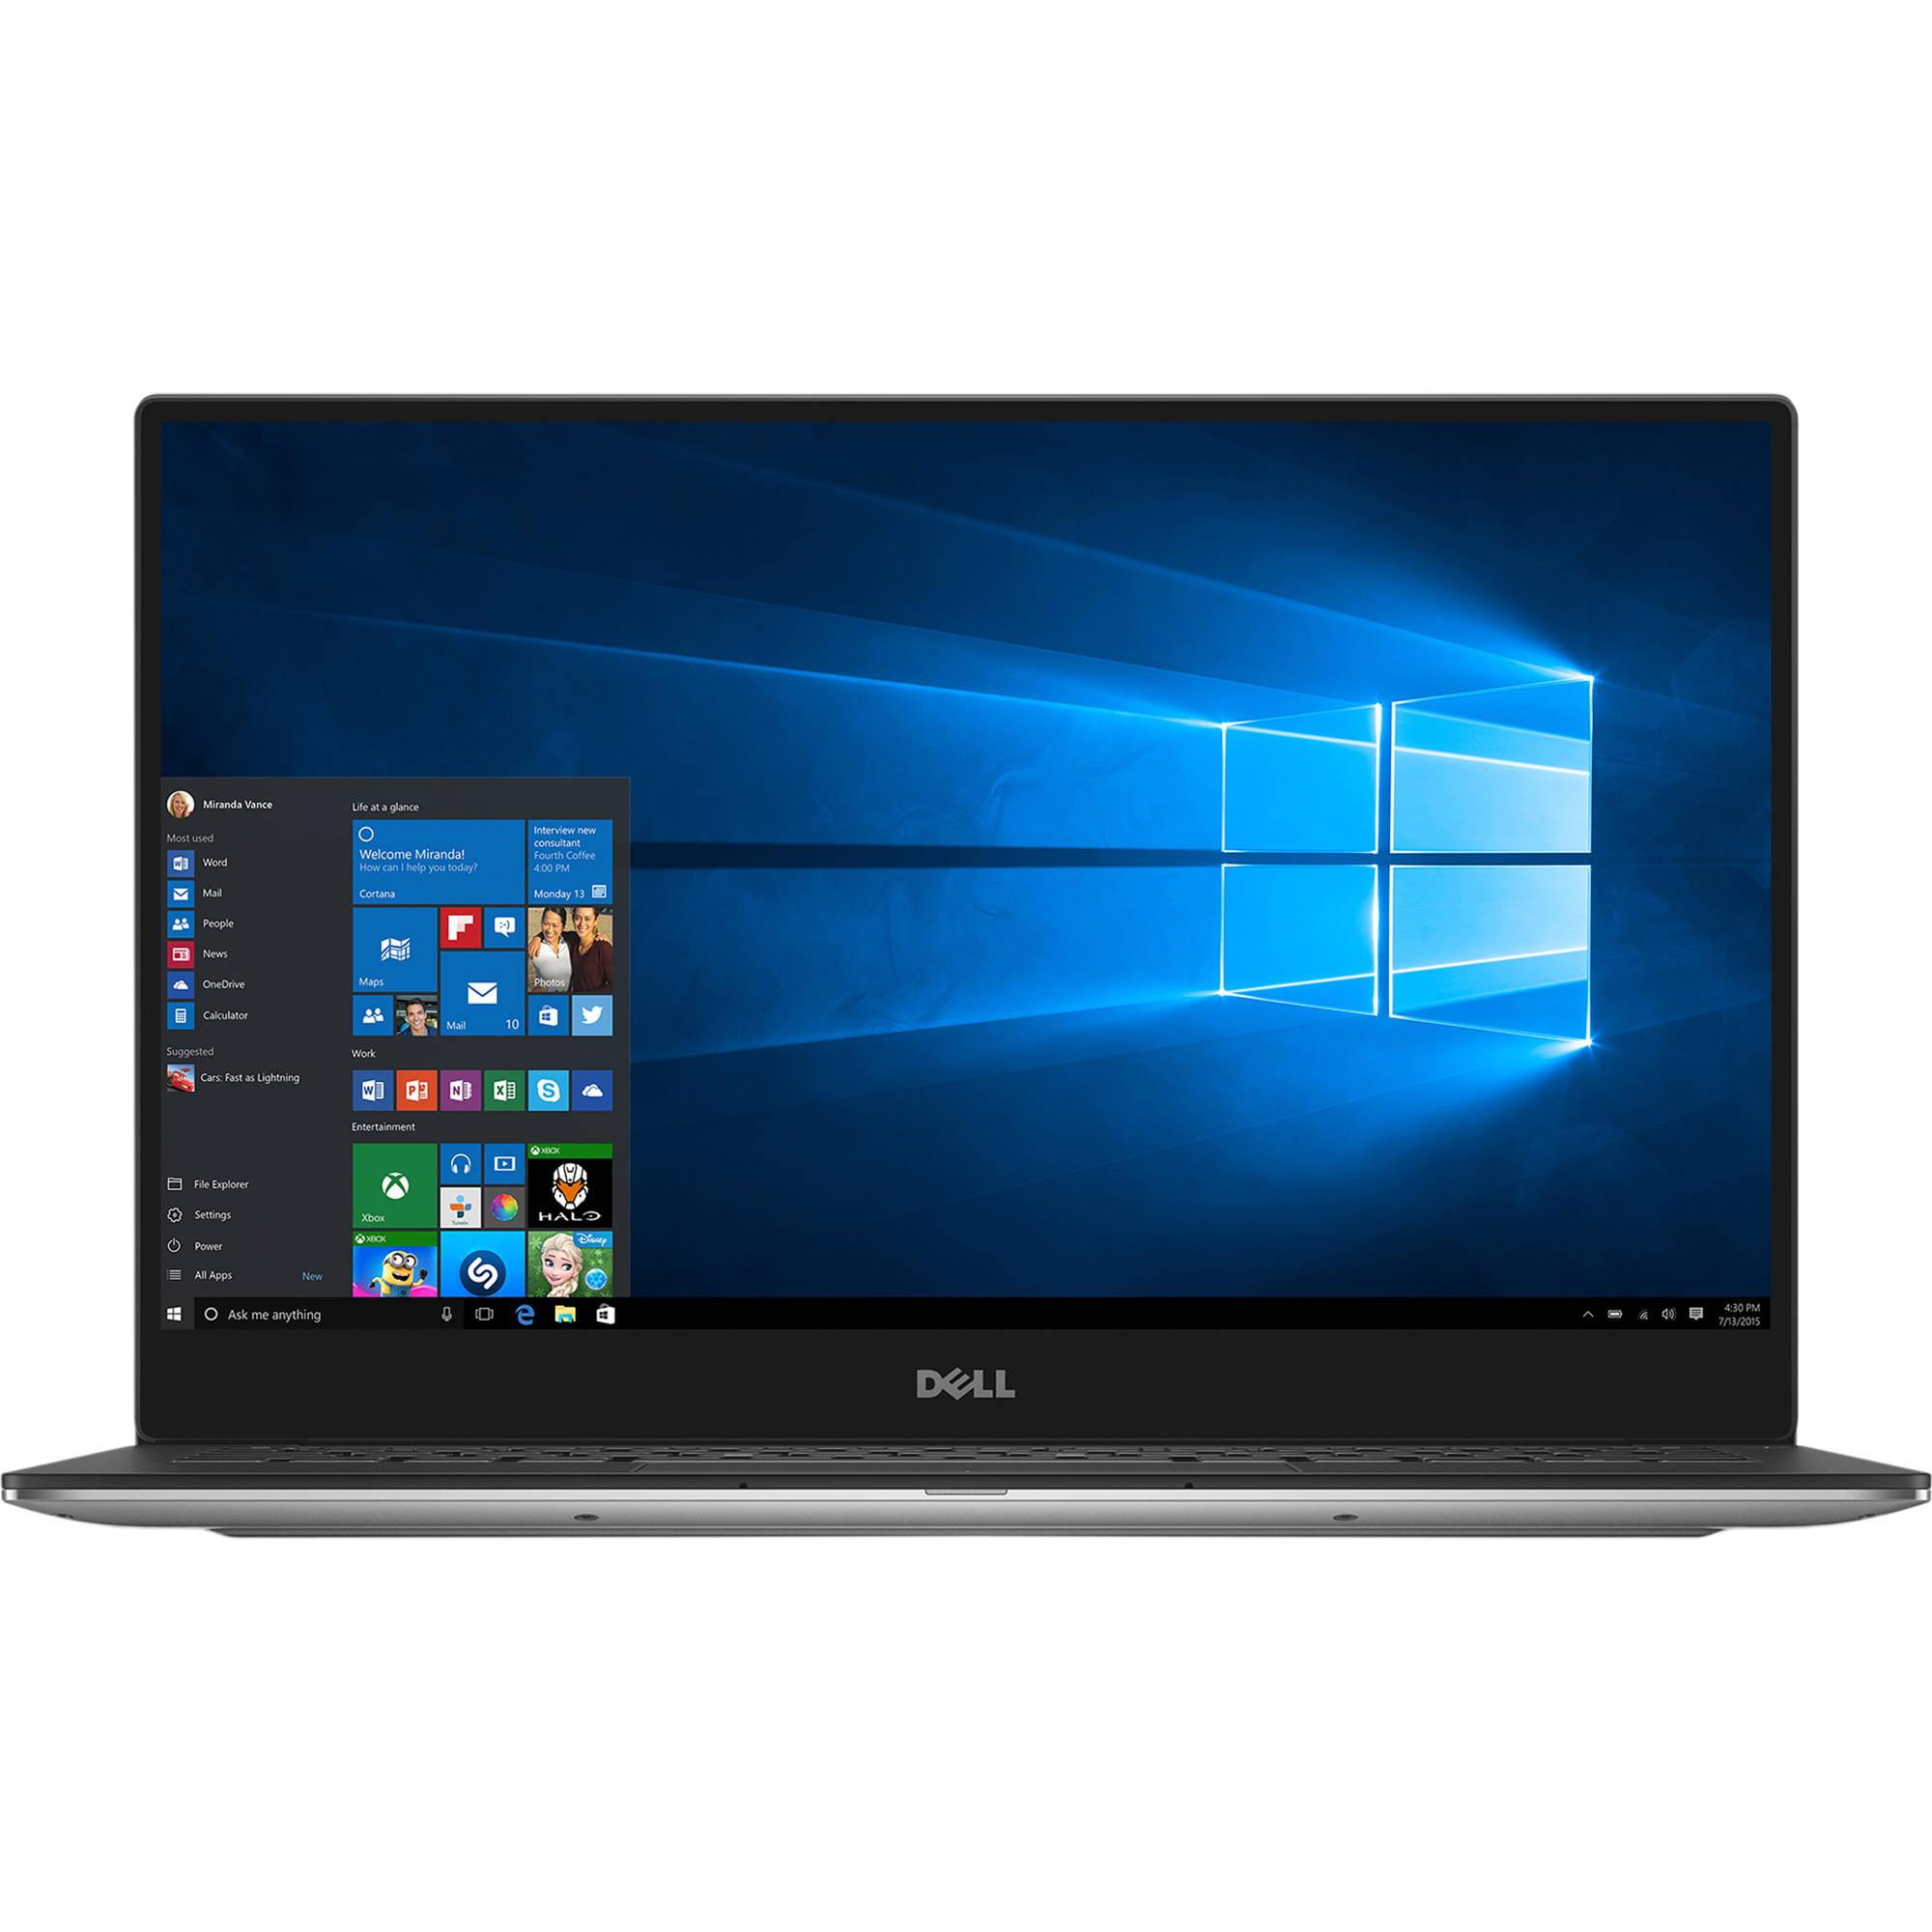 Refurbished Dell XPS 13 9360 i7-7500U 8GB 256GB PCIe SSD QHD+ Touch INFINITY Rose Gold W10PR